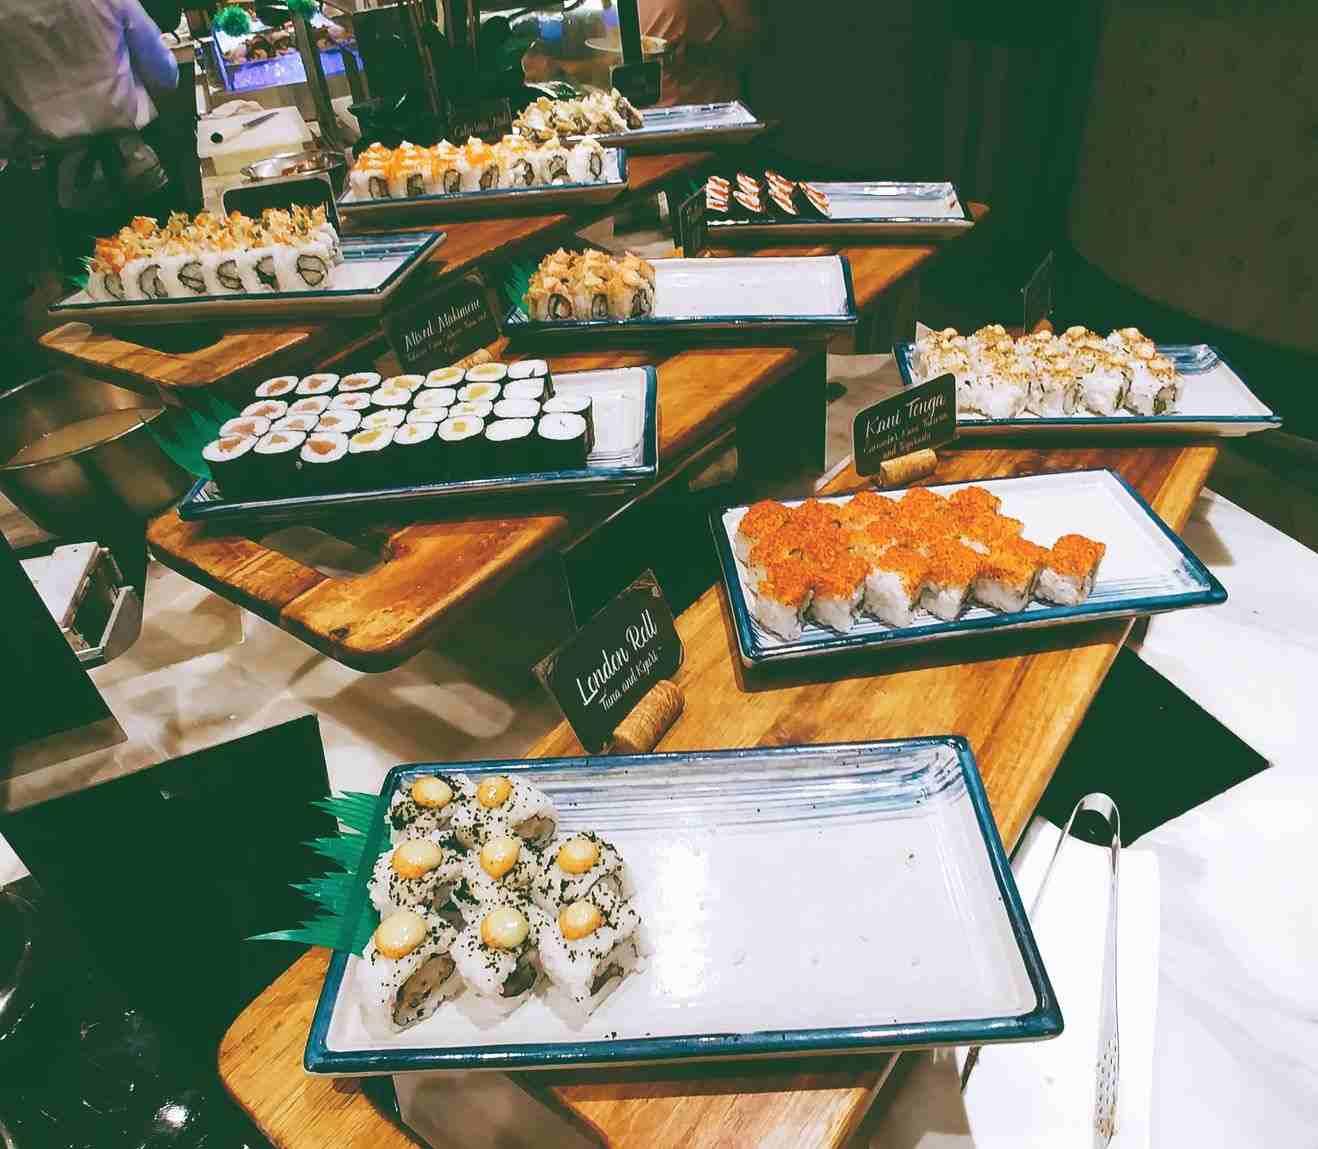 Vikings Luxury Buffet: sashimi and maki at the Japanese food station